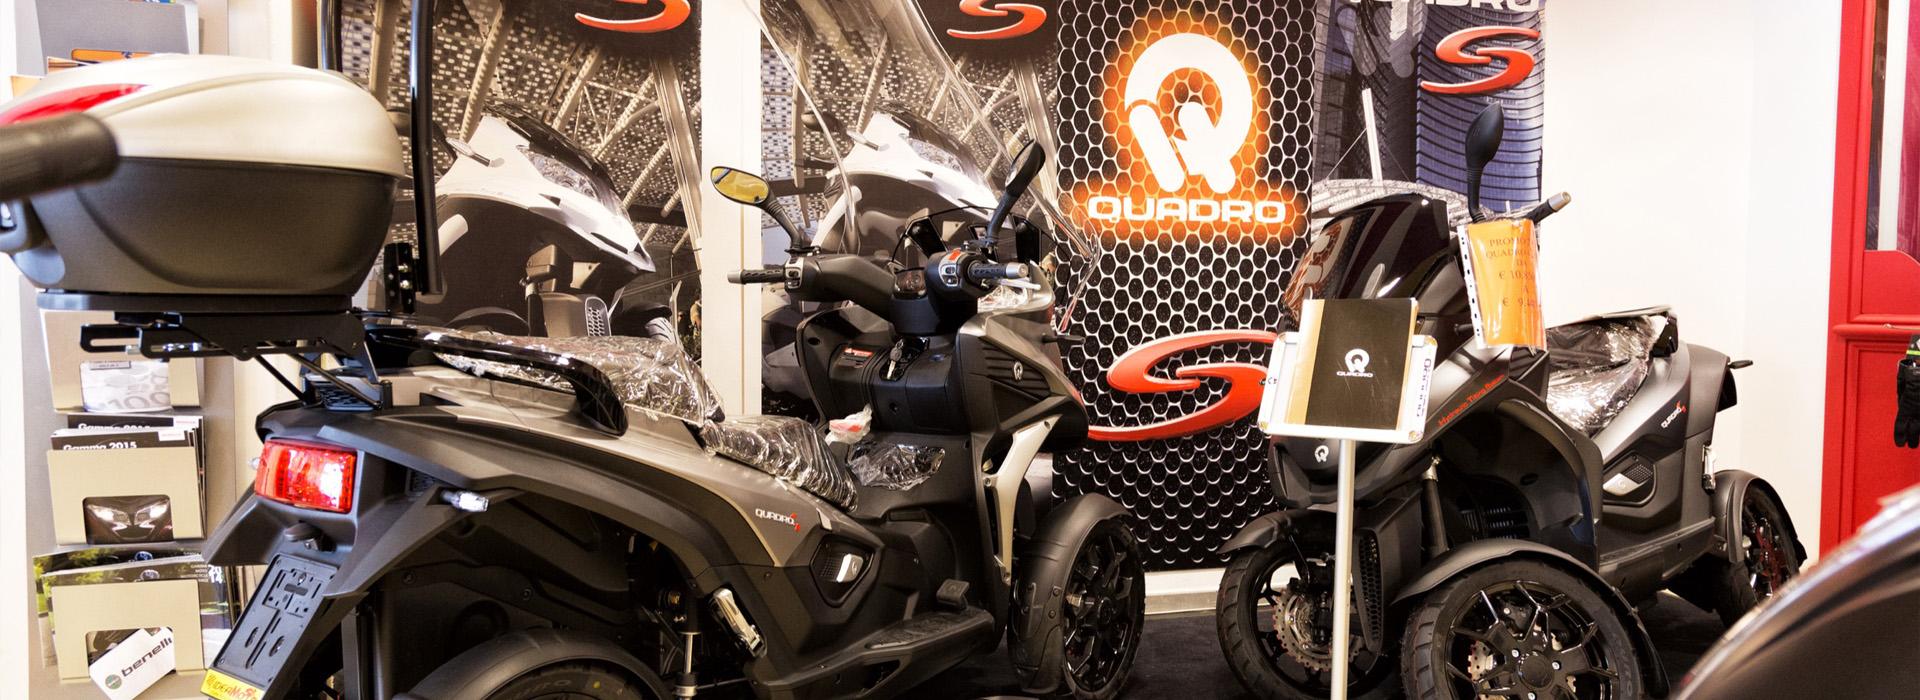 concessionario moto scooter livorno